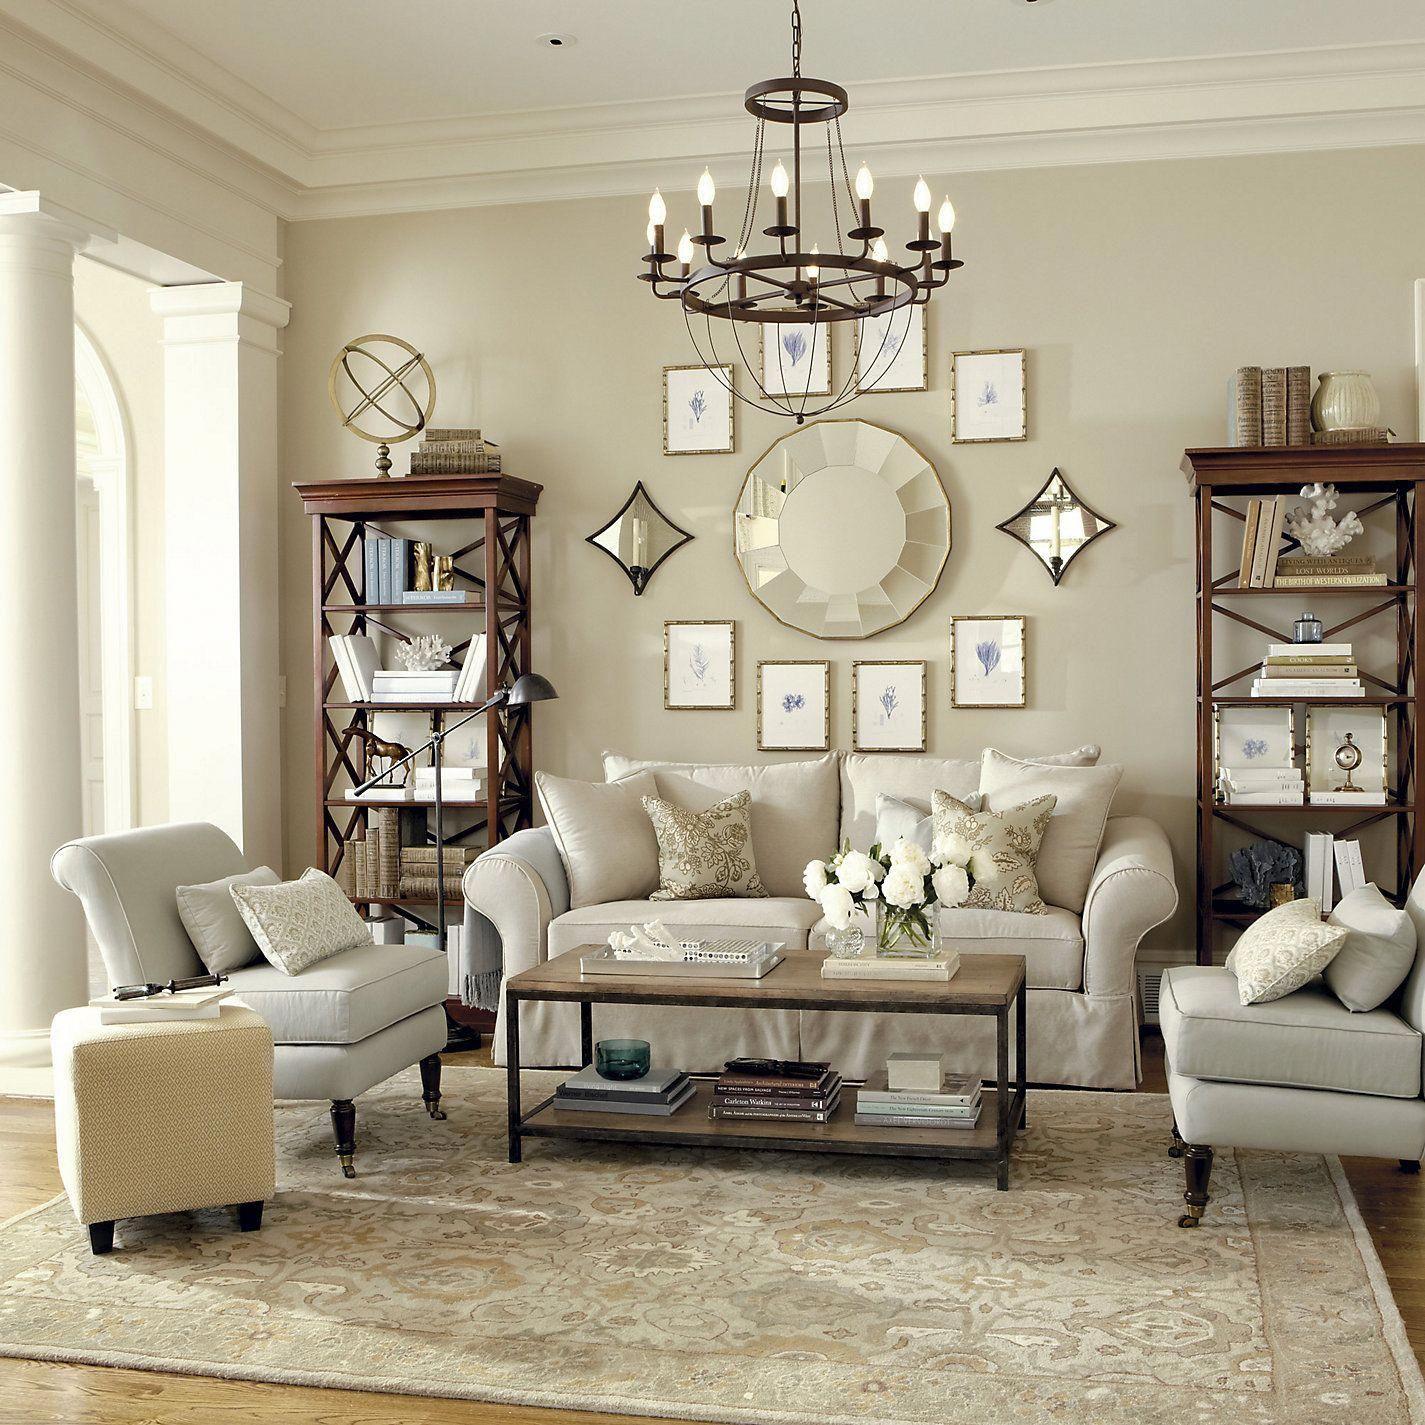 Living Room Furniture Layout, Living Room